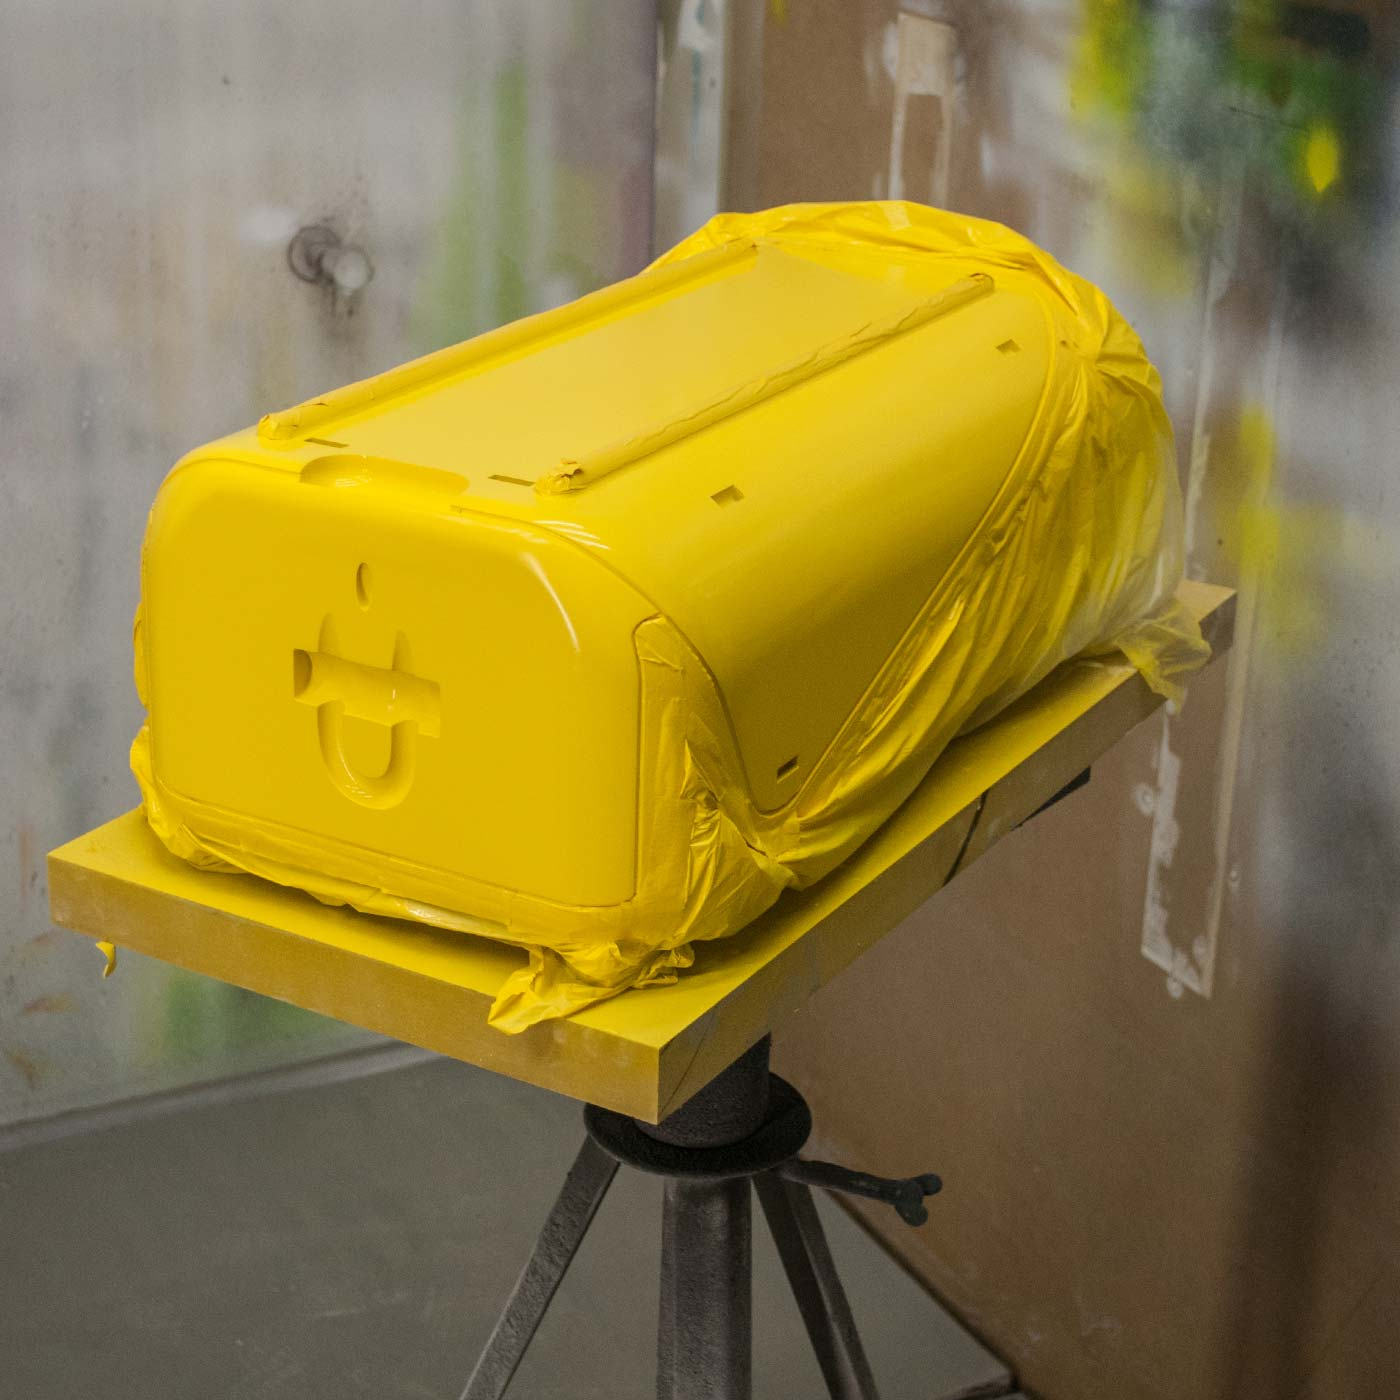 Stadtkoffer designed by WACH designstudio gets yellow paint job